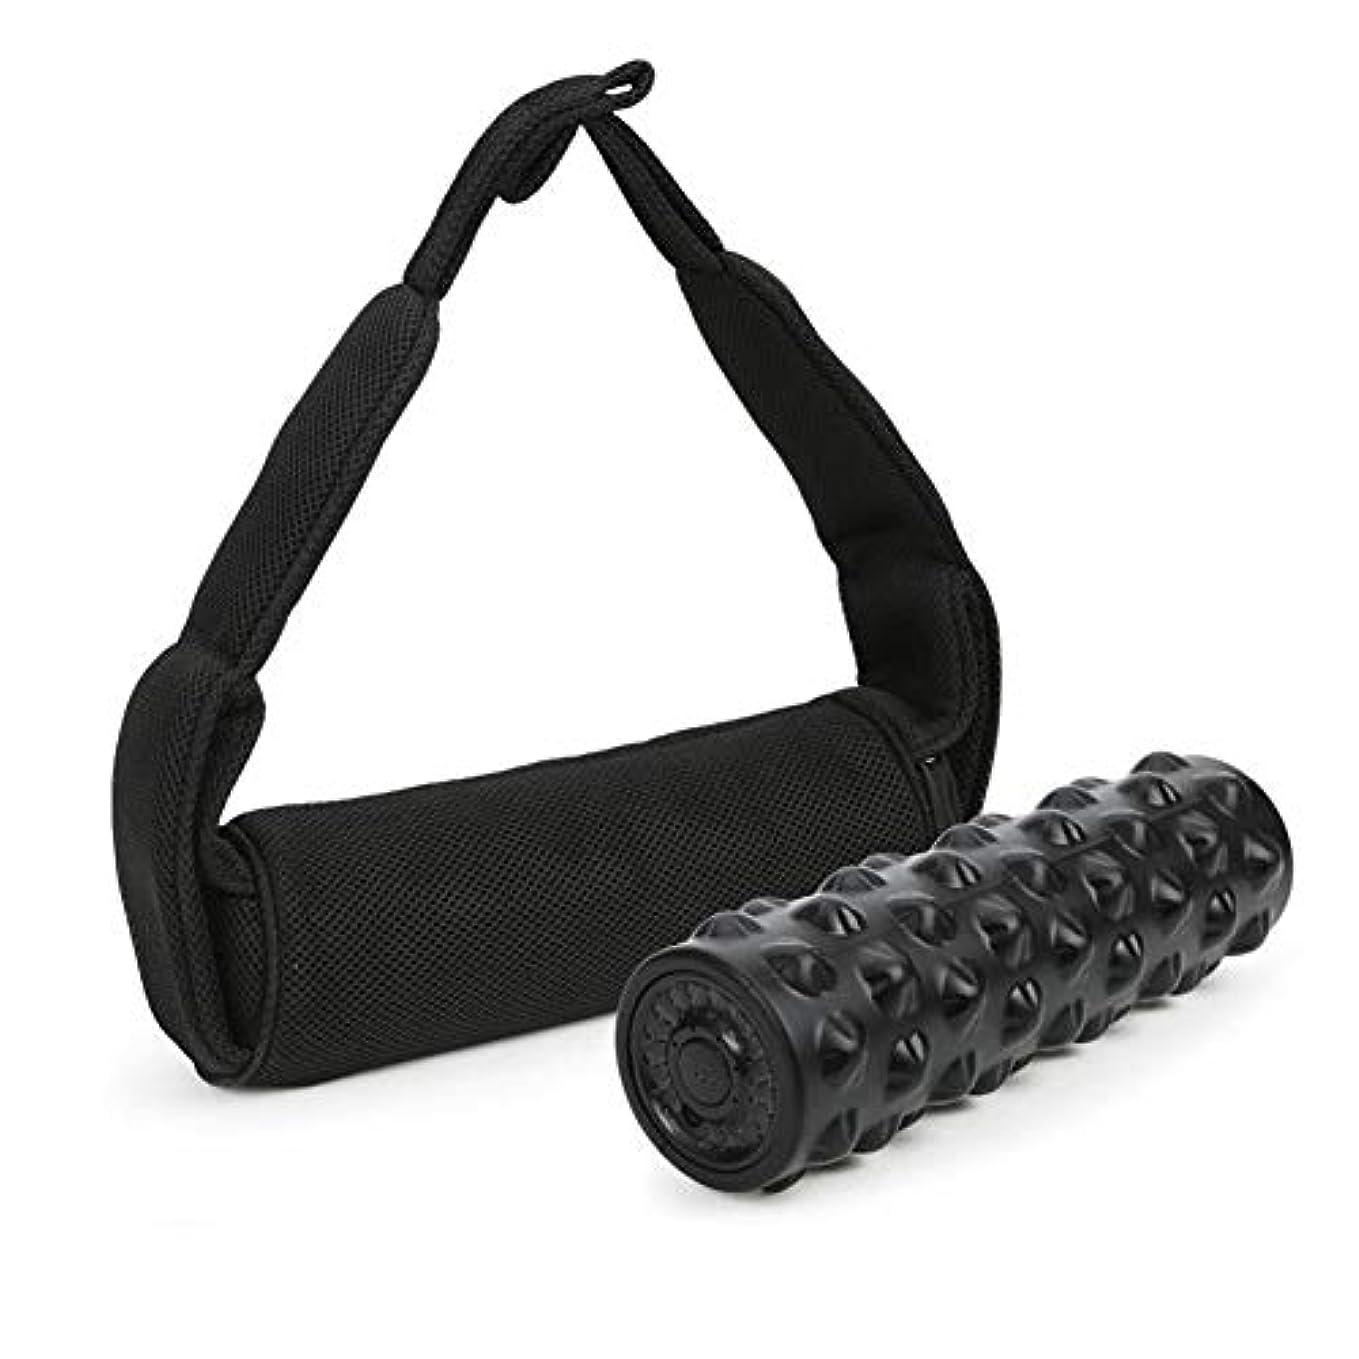 Semmeの泡のローラーの振動のマッサージャー、筋肉回復、弛緩、移動性、柔軟性の訓練、六角形様式のための4つの速度の調節可能な家のヨガの体育館装置の深いティッシュのマッサージ用具